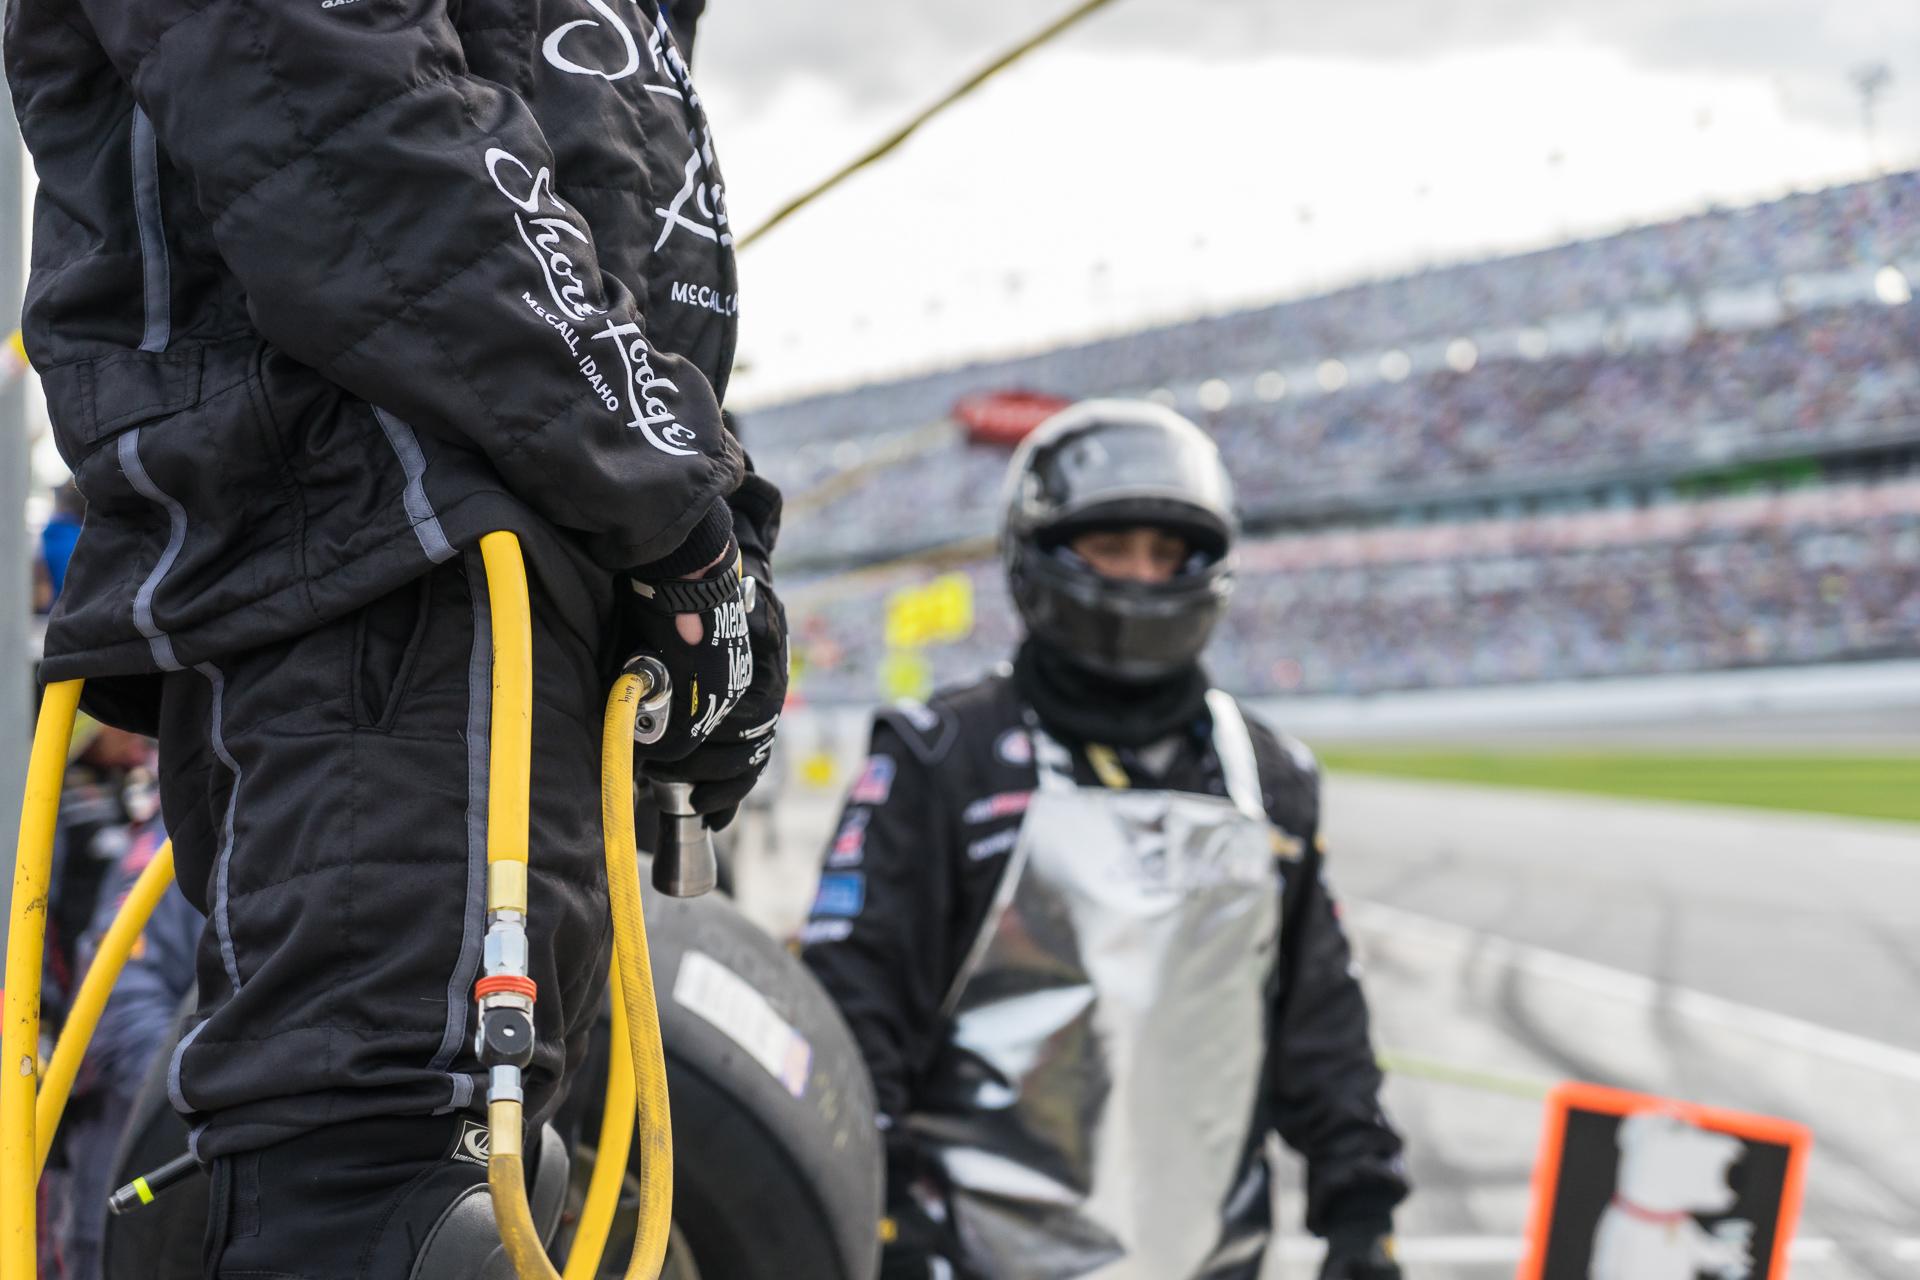 NASCAR Xfinity Series Daytona Speedway